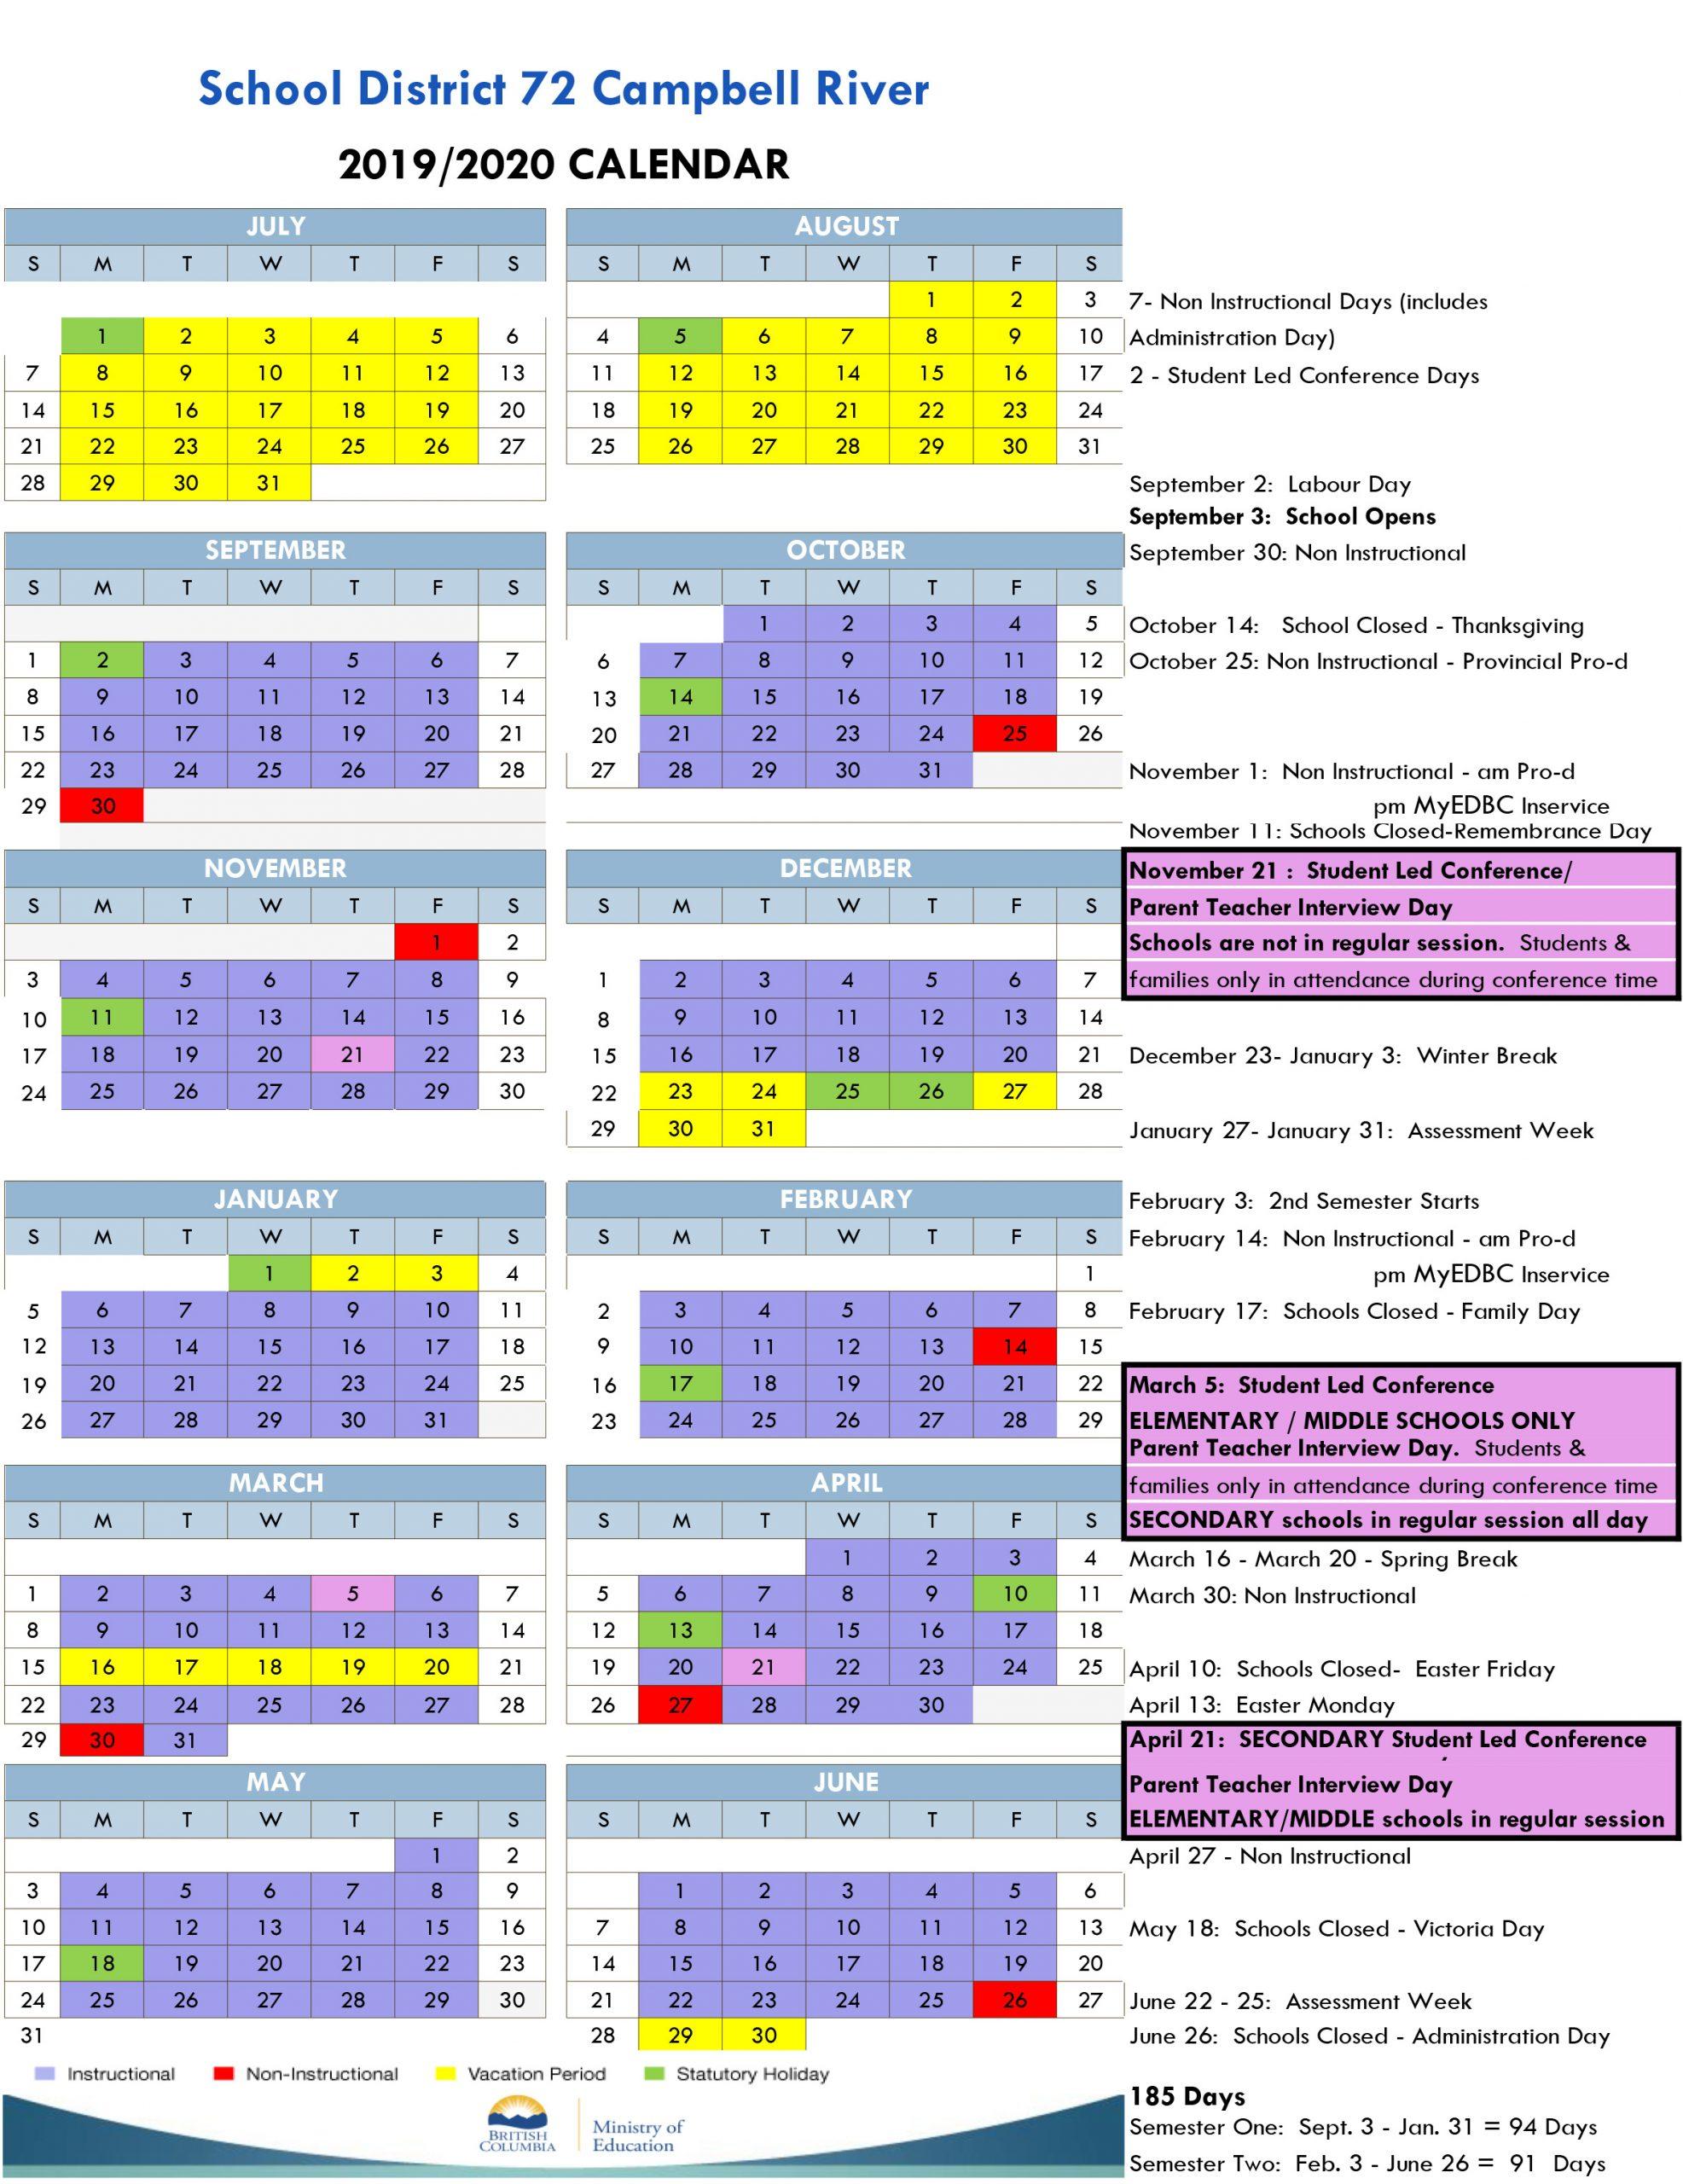 Georgia State University 2021 2021 Calendar | Printable Inside Gsu Academic Calendar 2021 2020